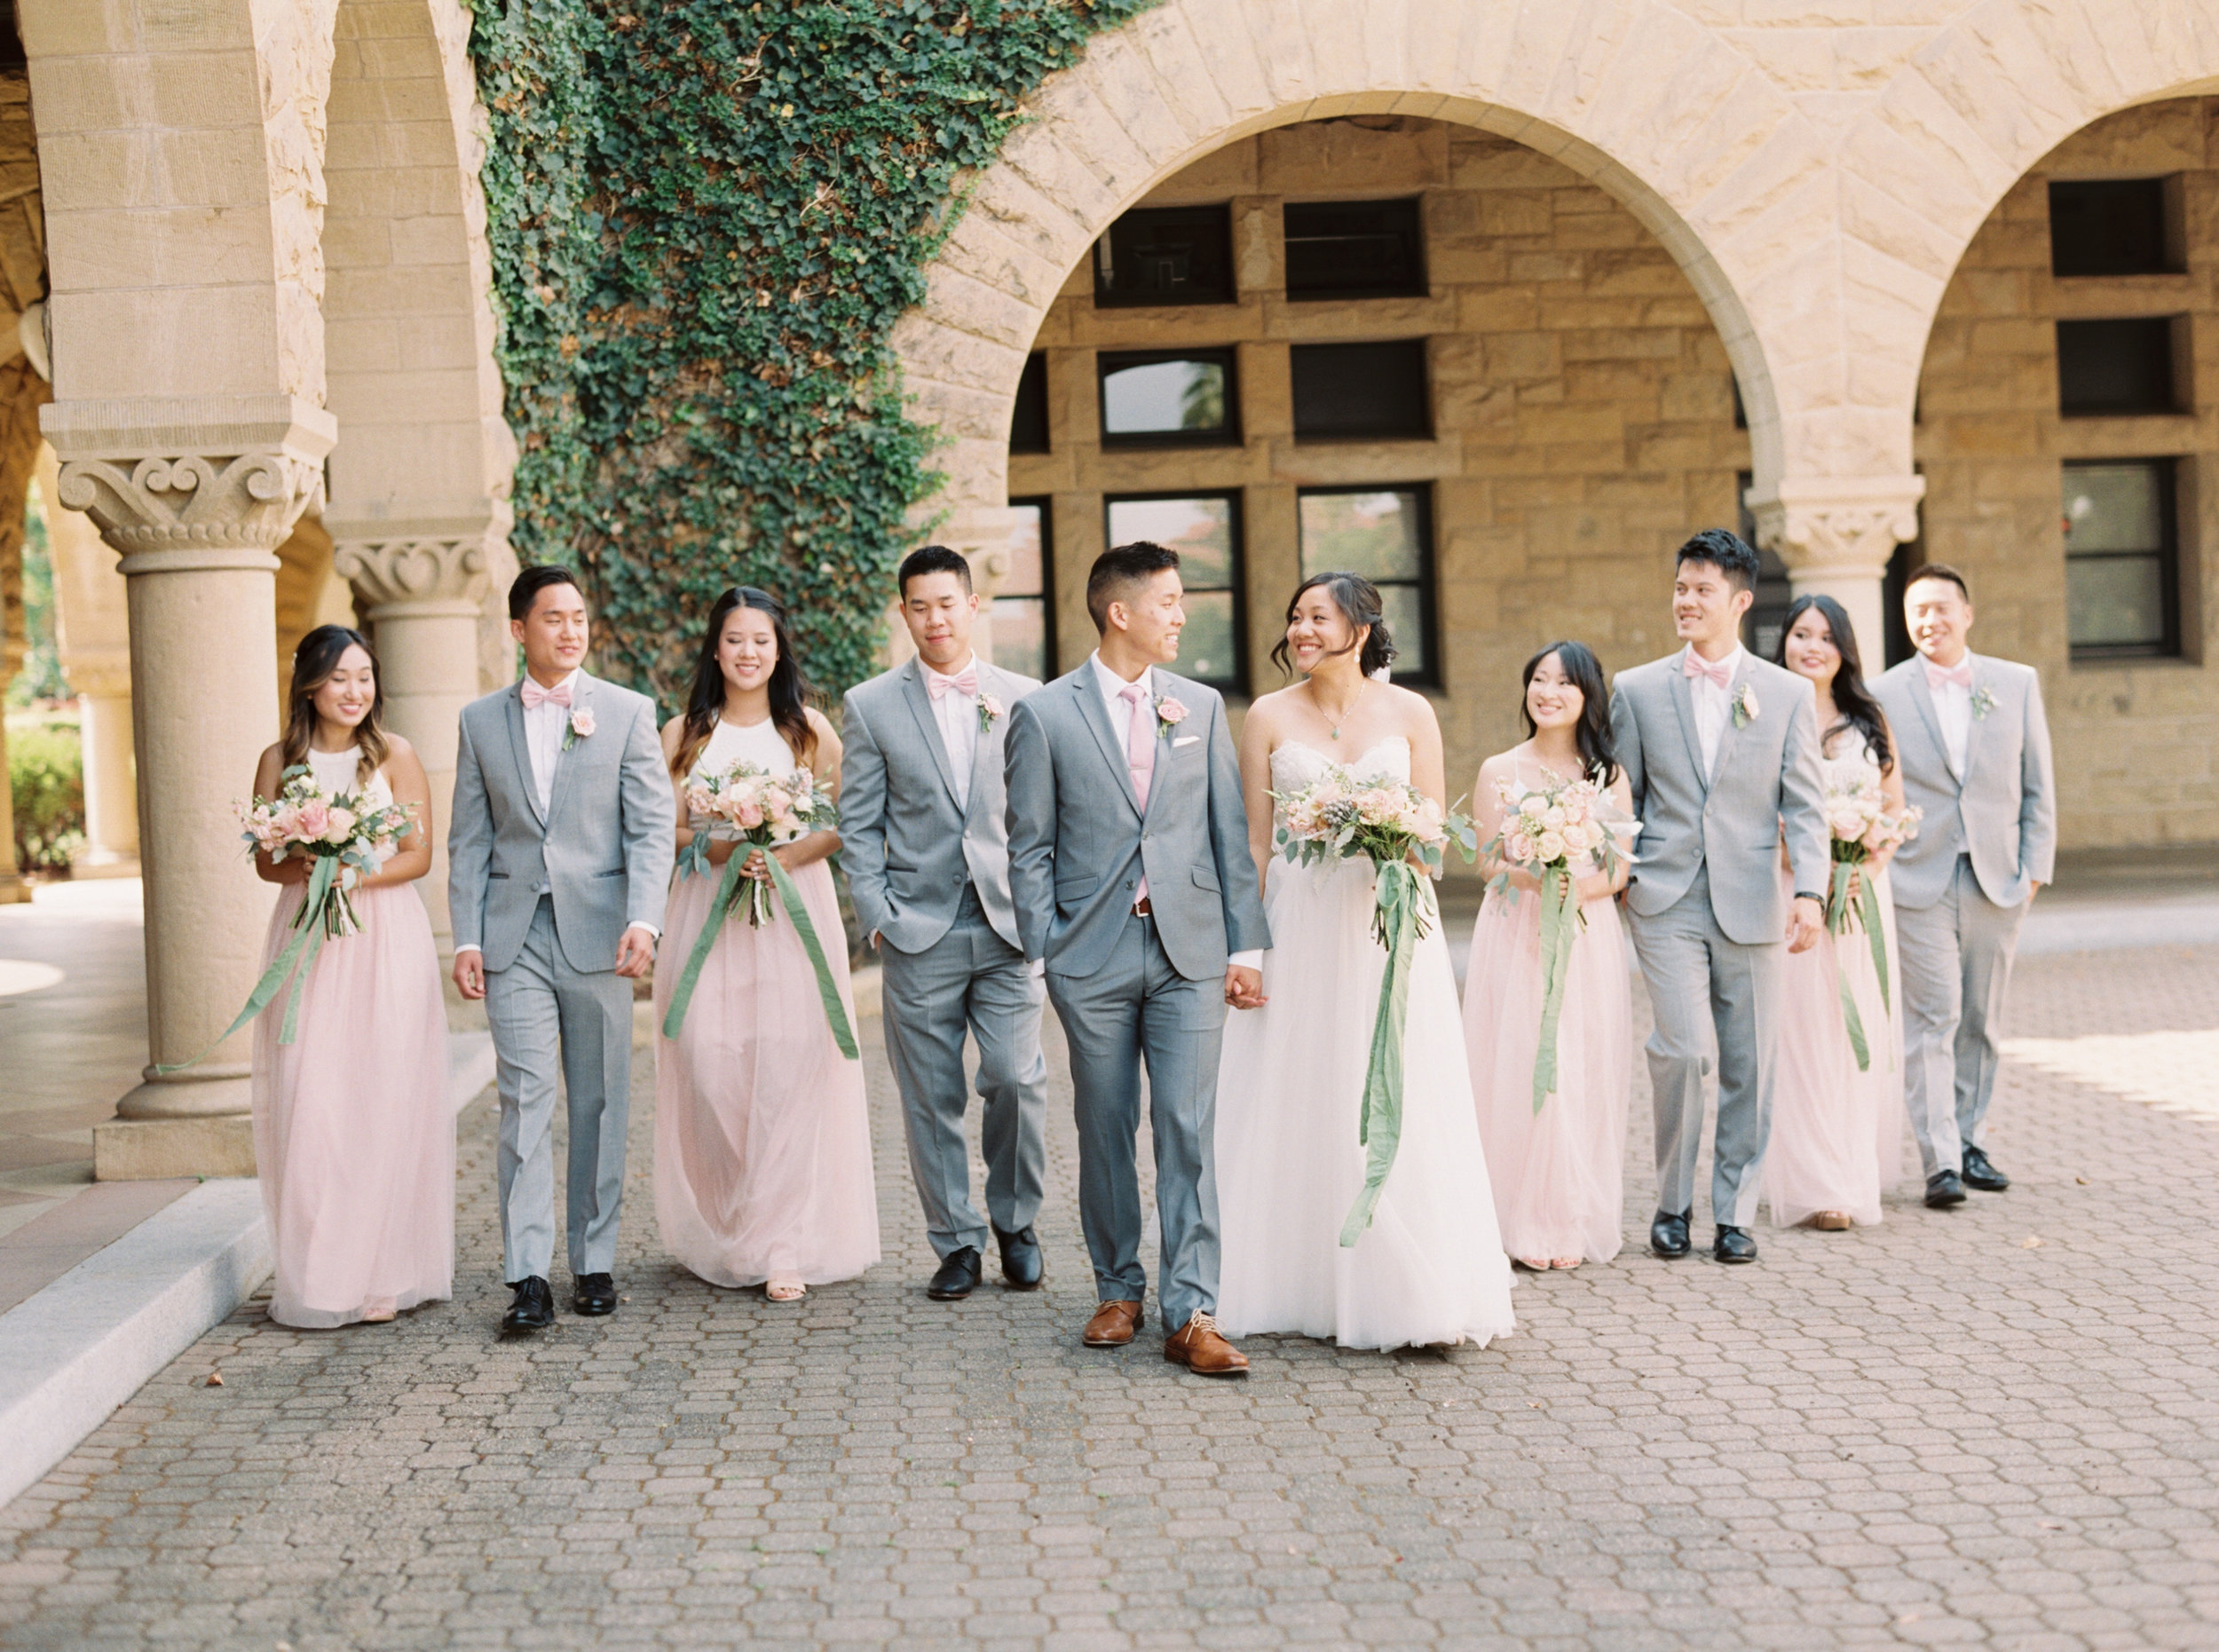 trynhphoto_wedding_photography_Standford_PaloAlto_SF_BayArea_Destination_OC_HA-13.jpg